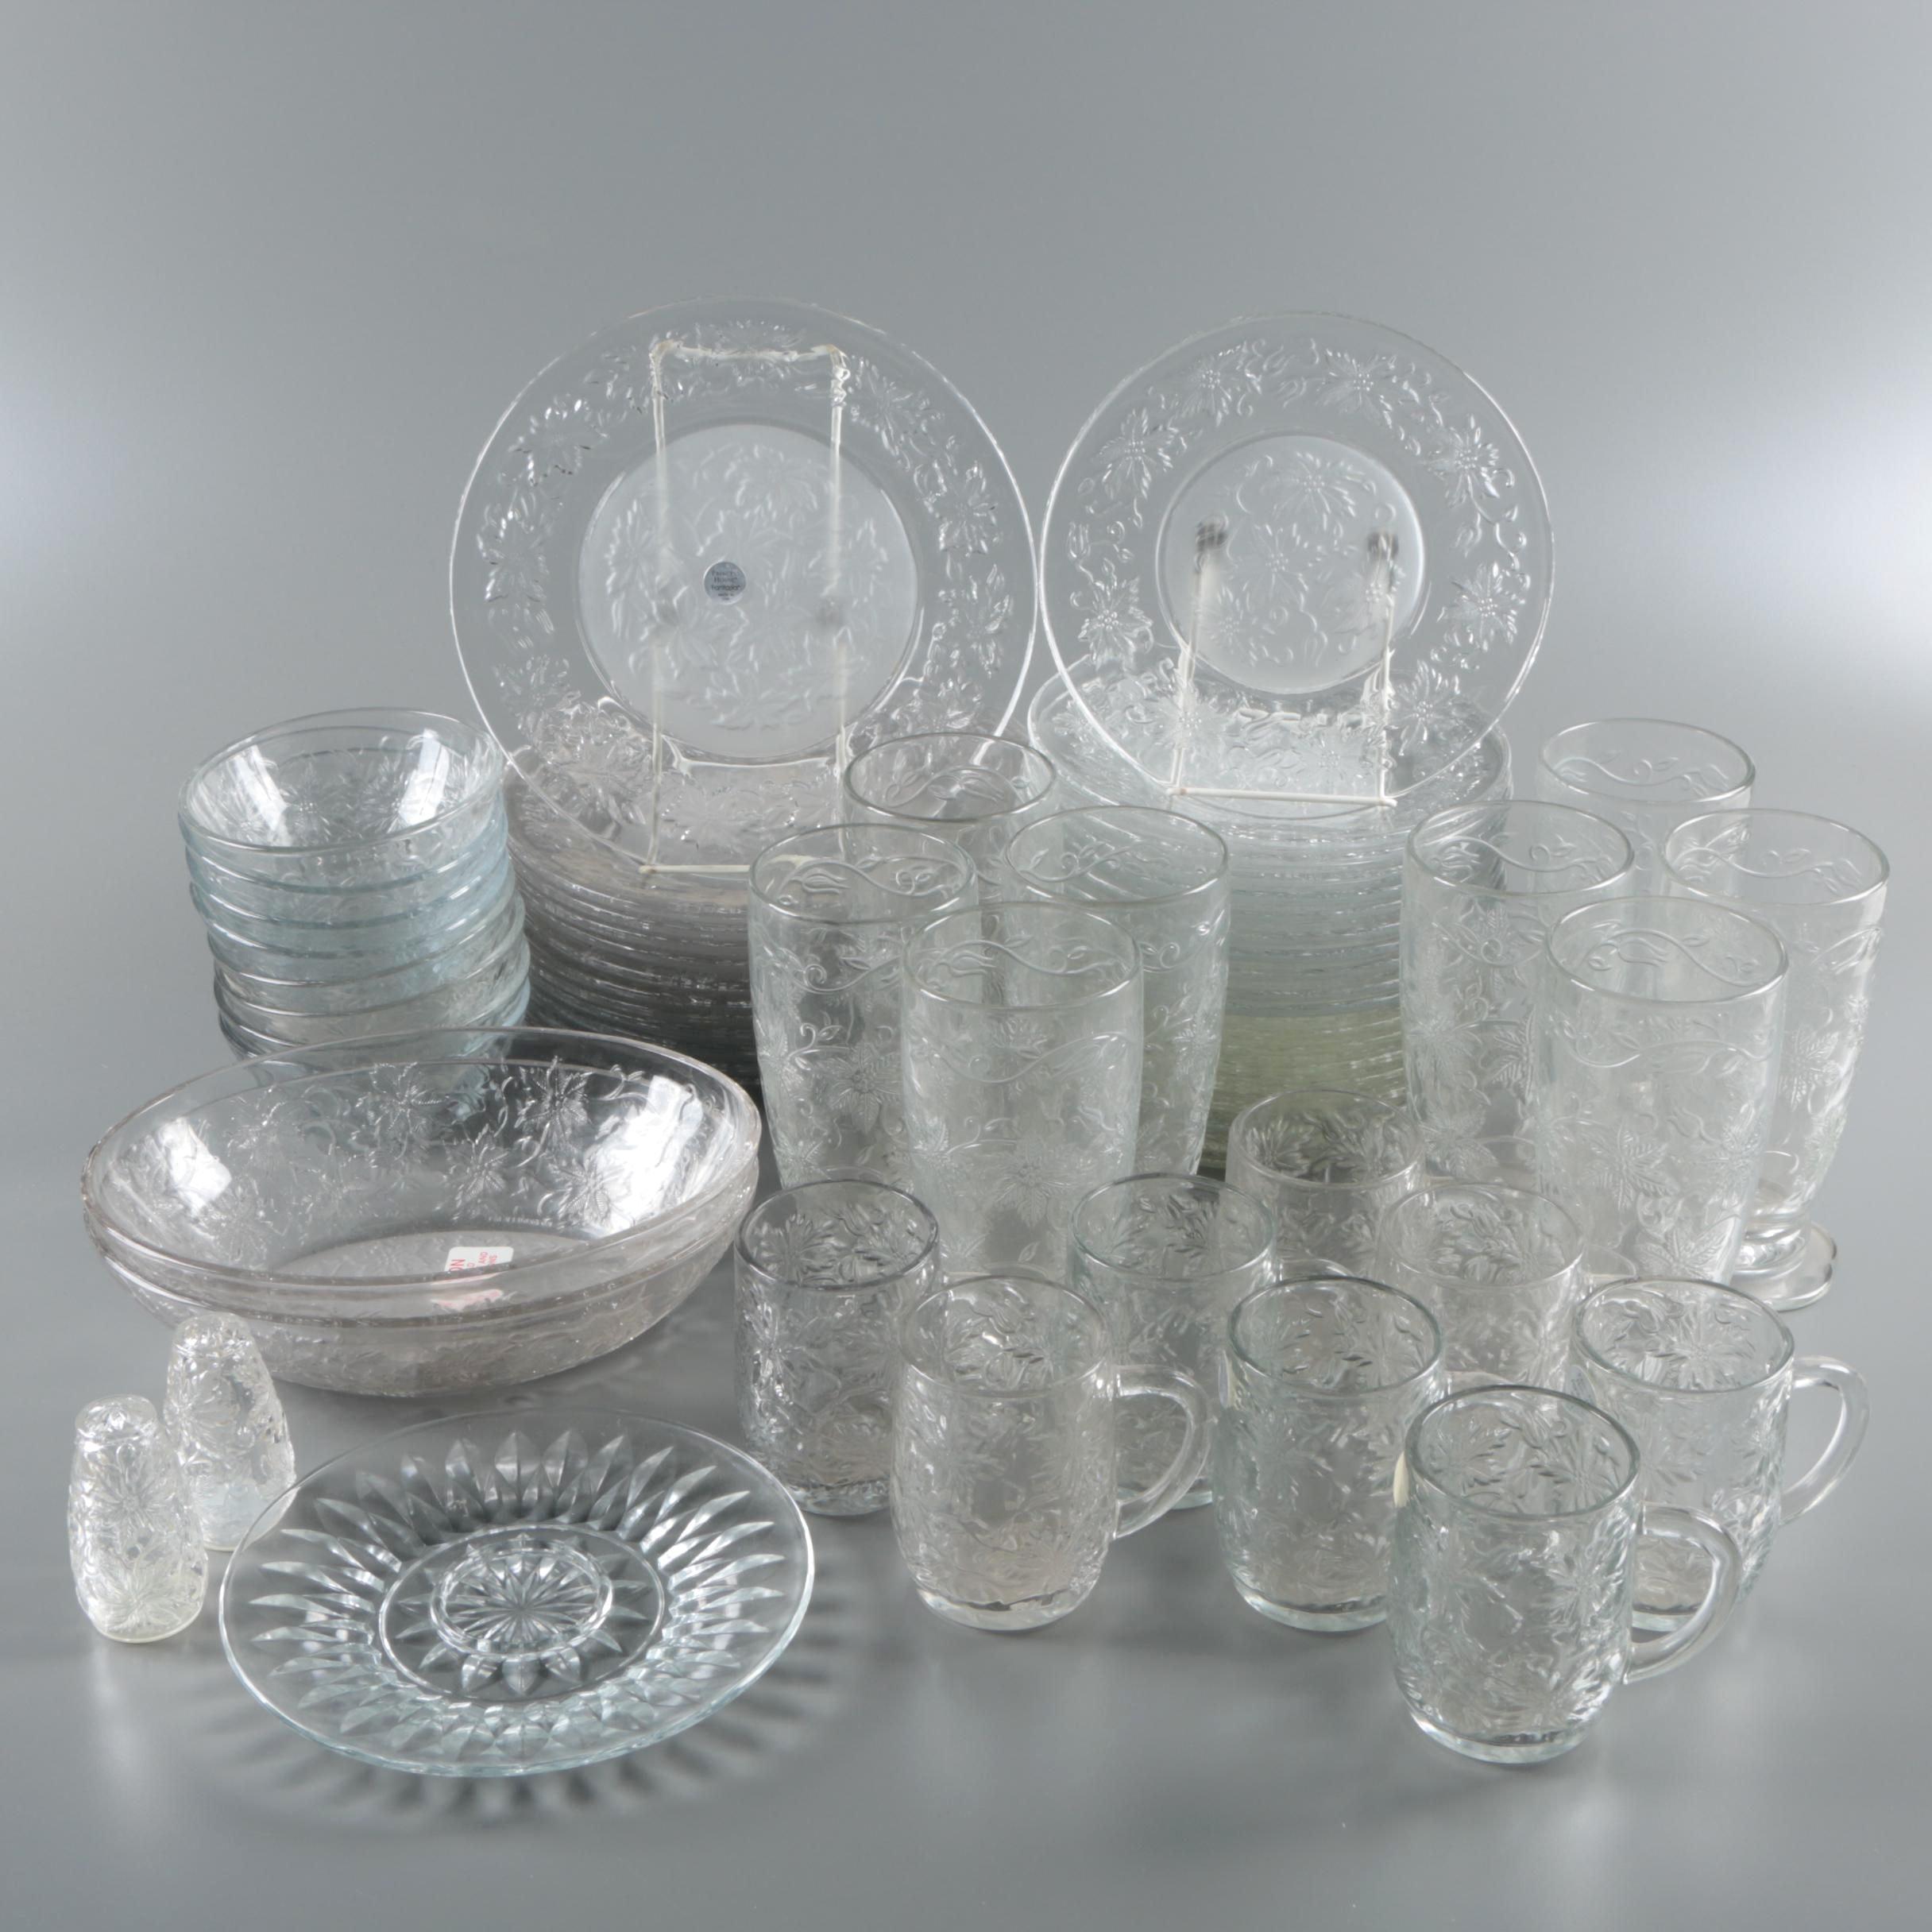 "Princess House"" Fantasia"" Pressed Glass Tableware"